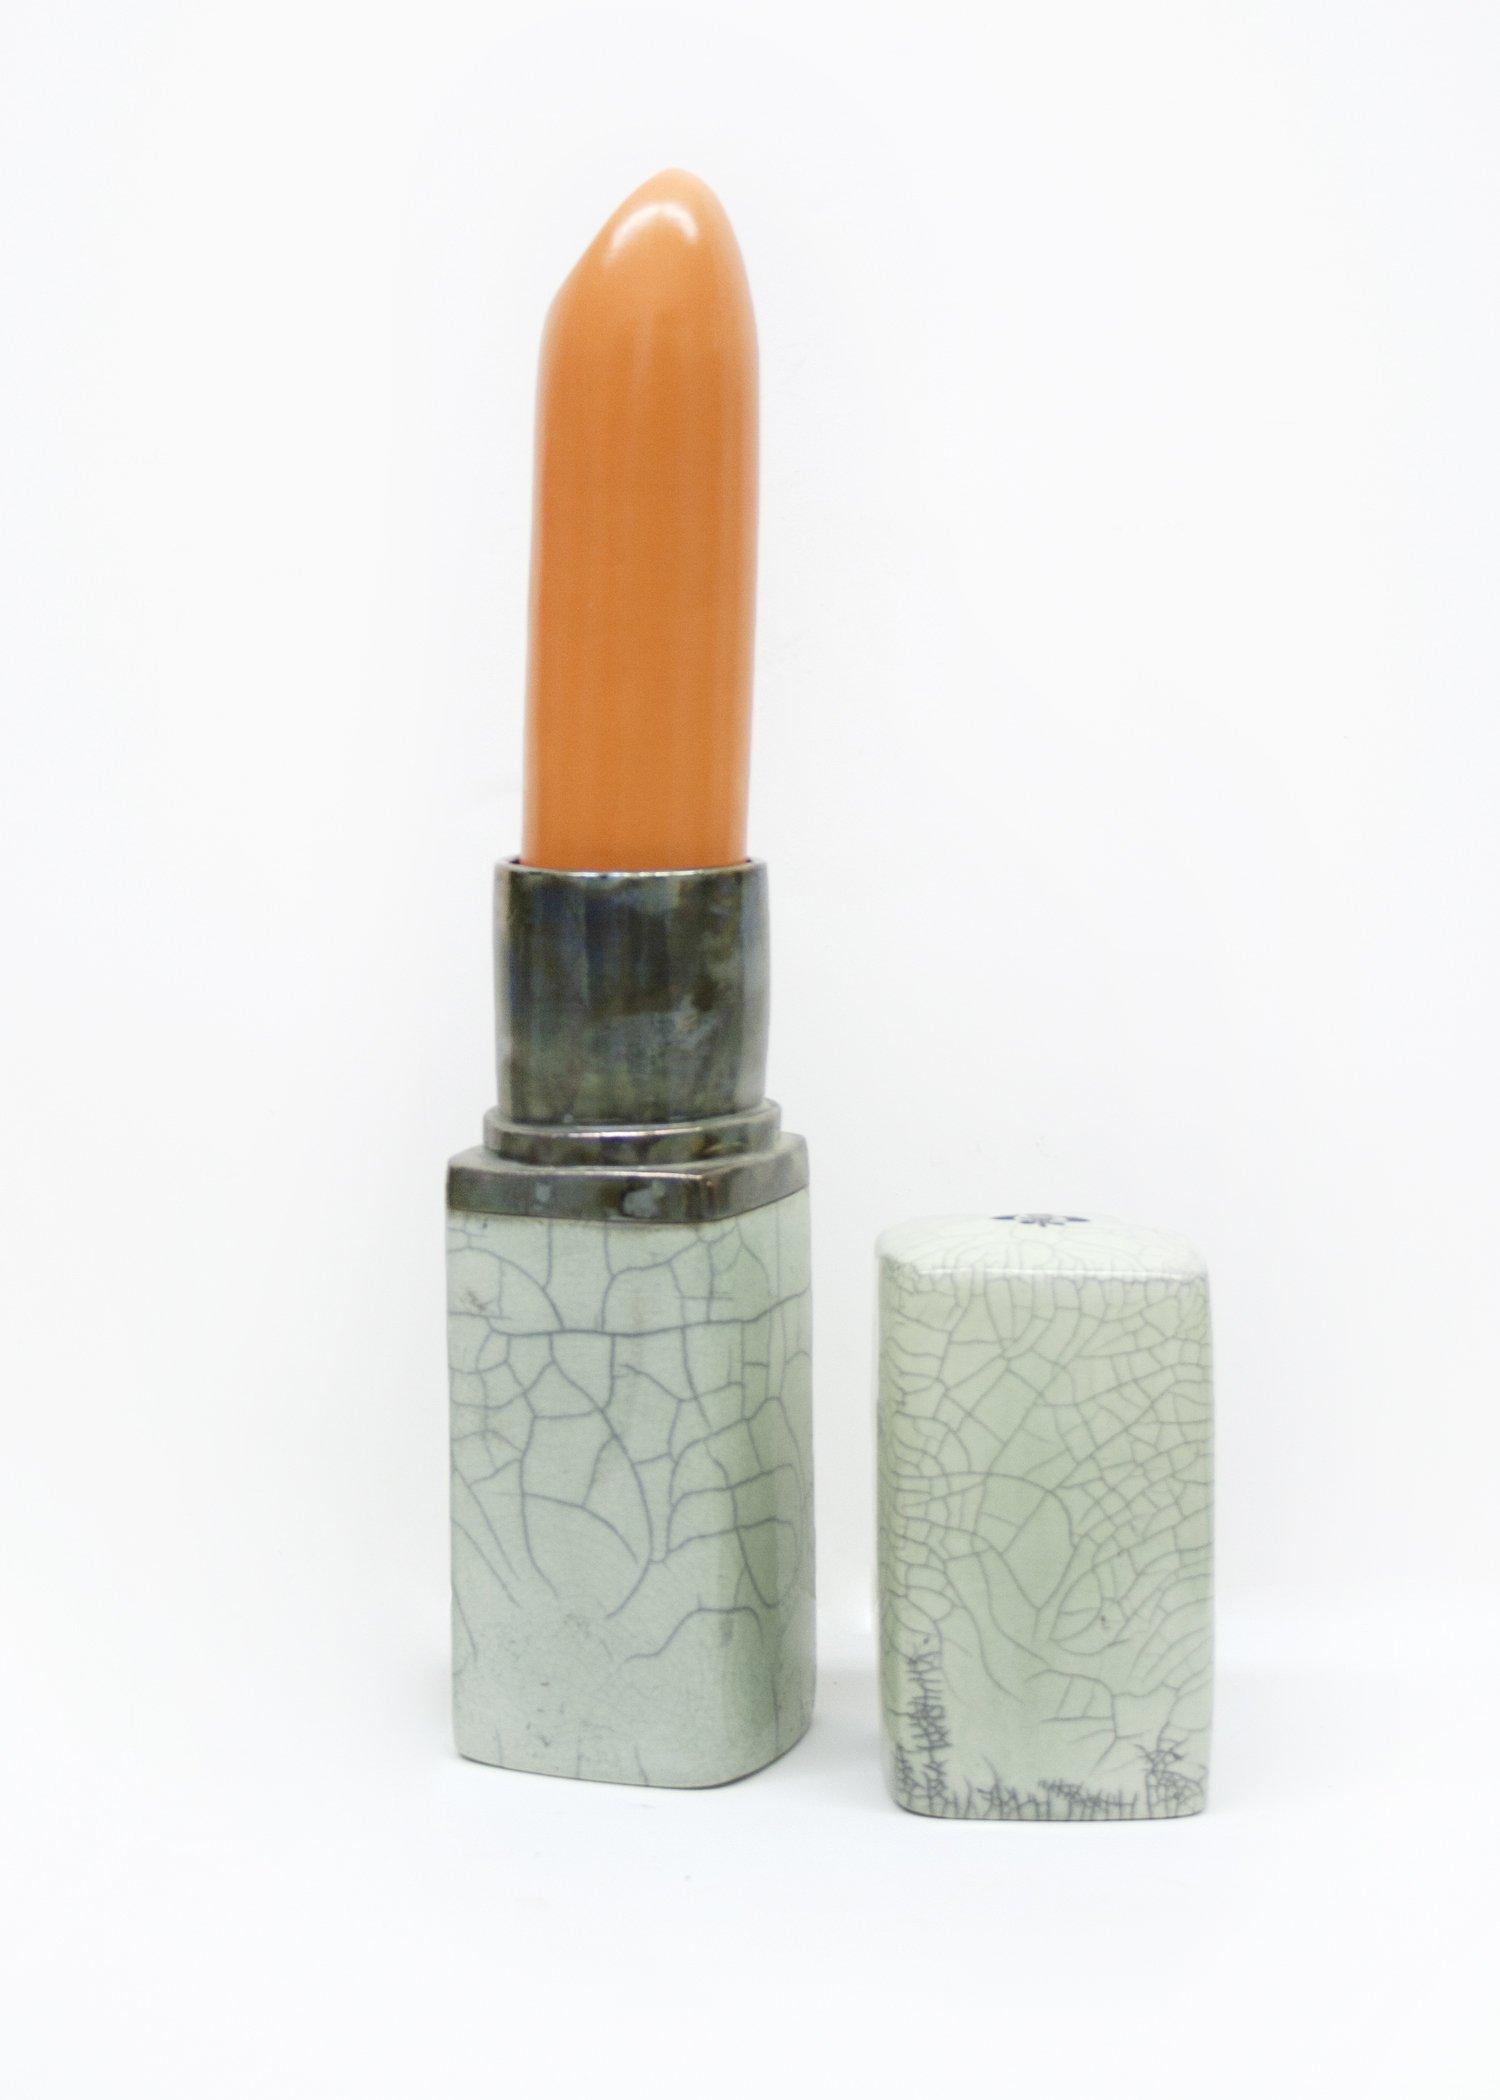 Karen Shapiro, Giant Lipstick, 2001